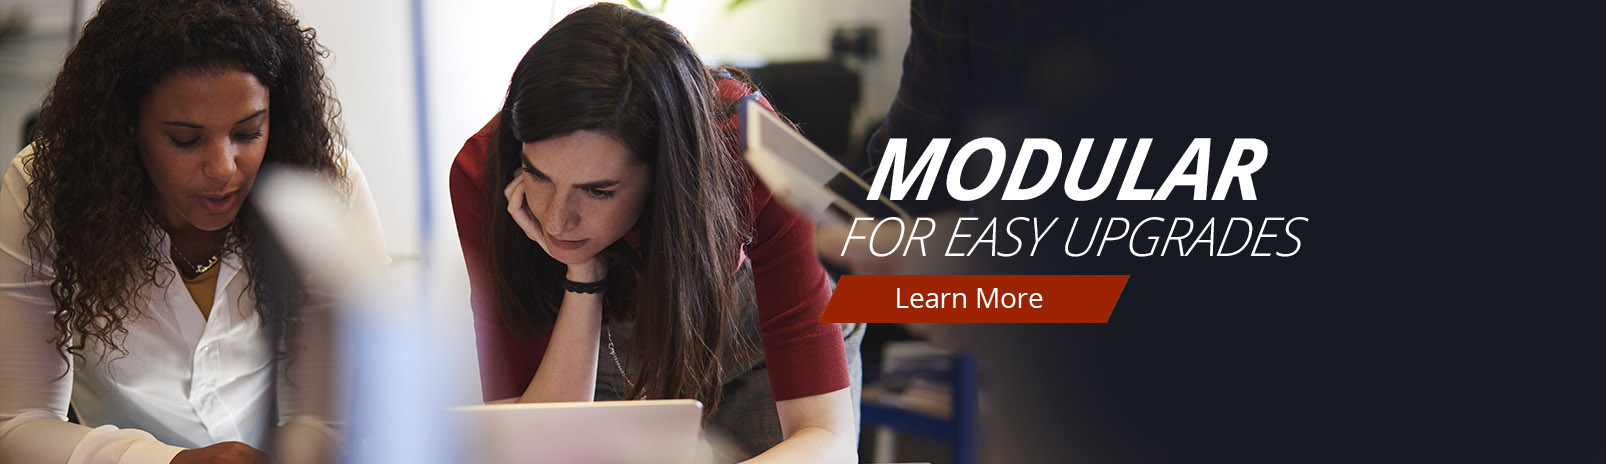 Modular For Easy Upgrades